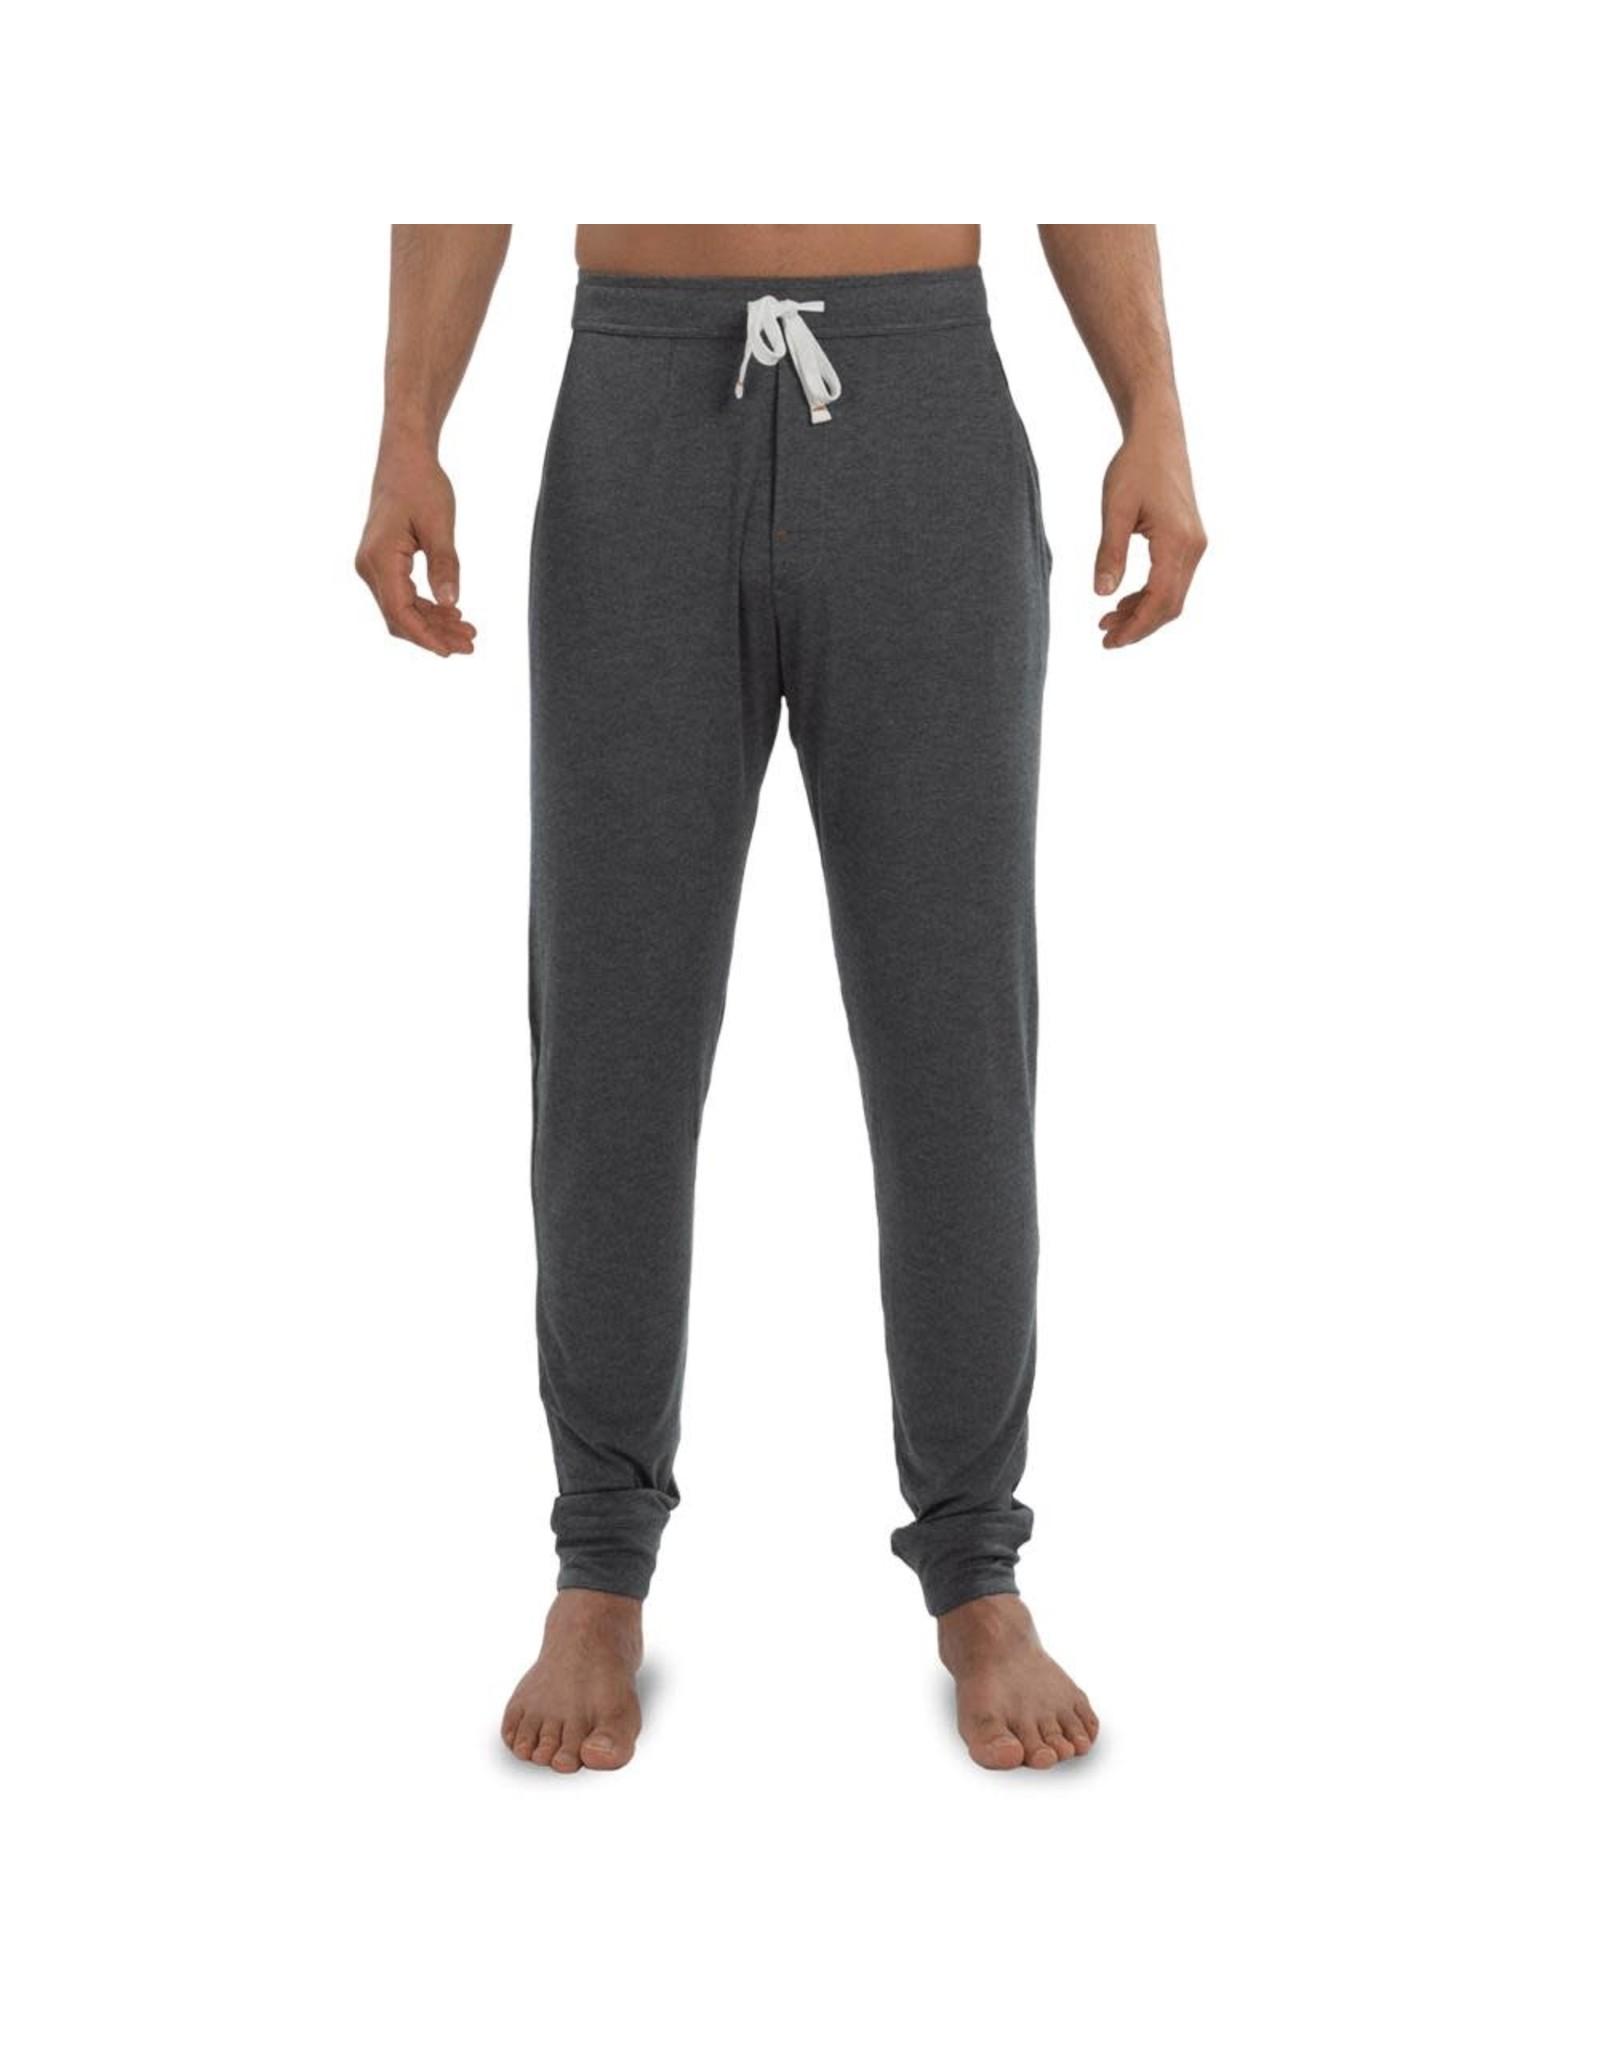 Saxx Saxx Snooze Pant - Dark Charcoal